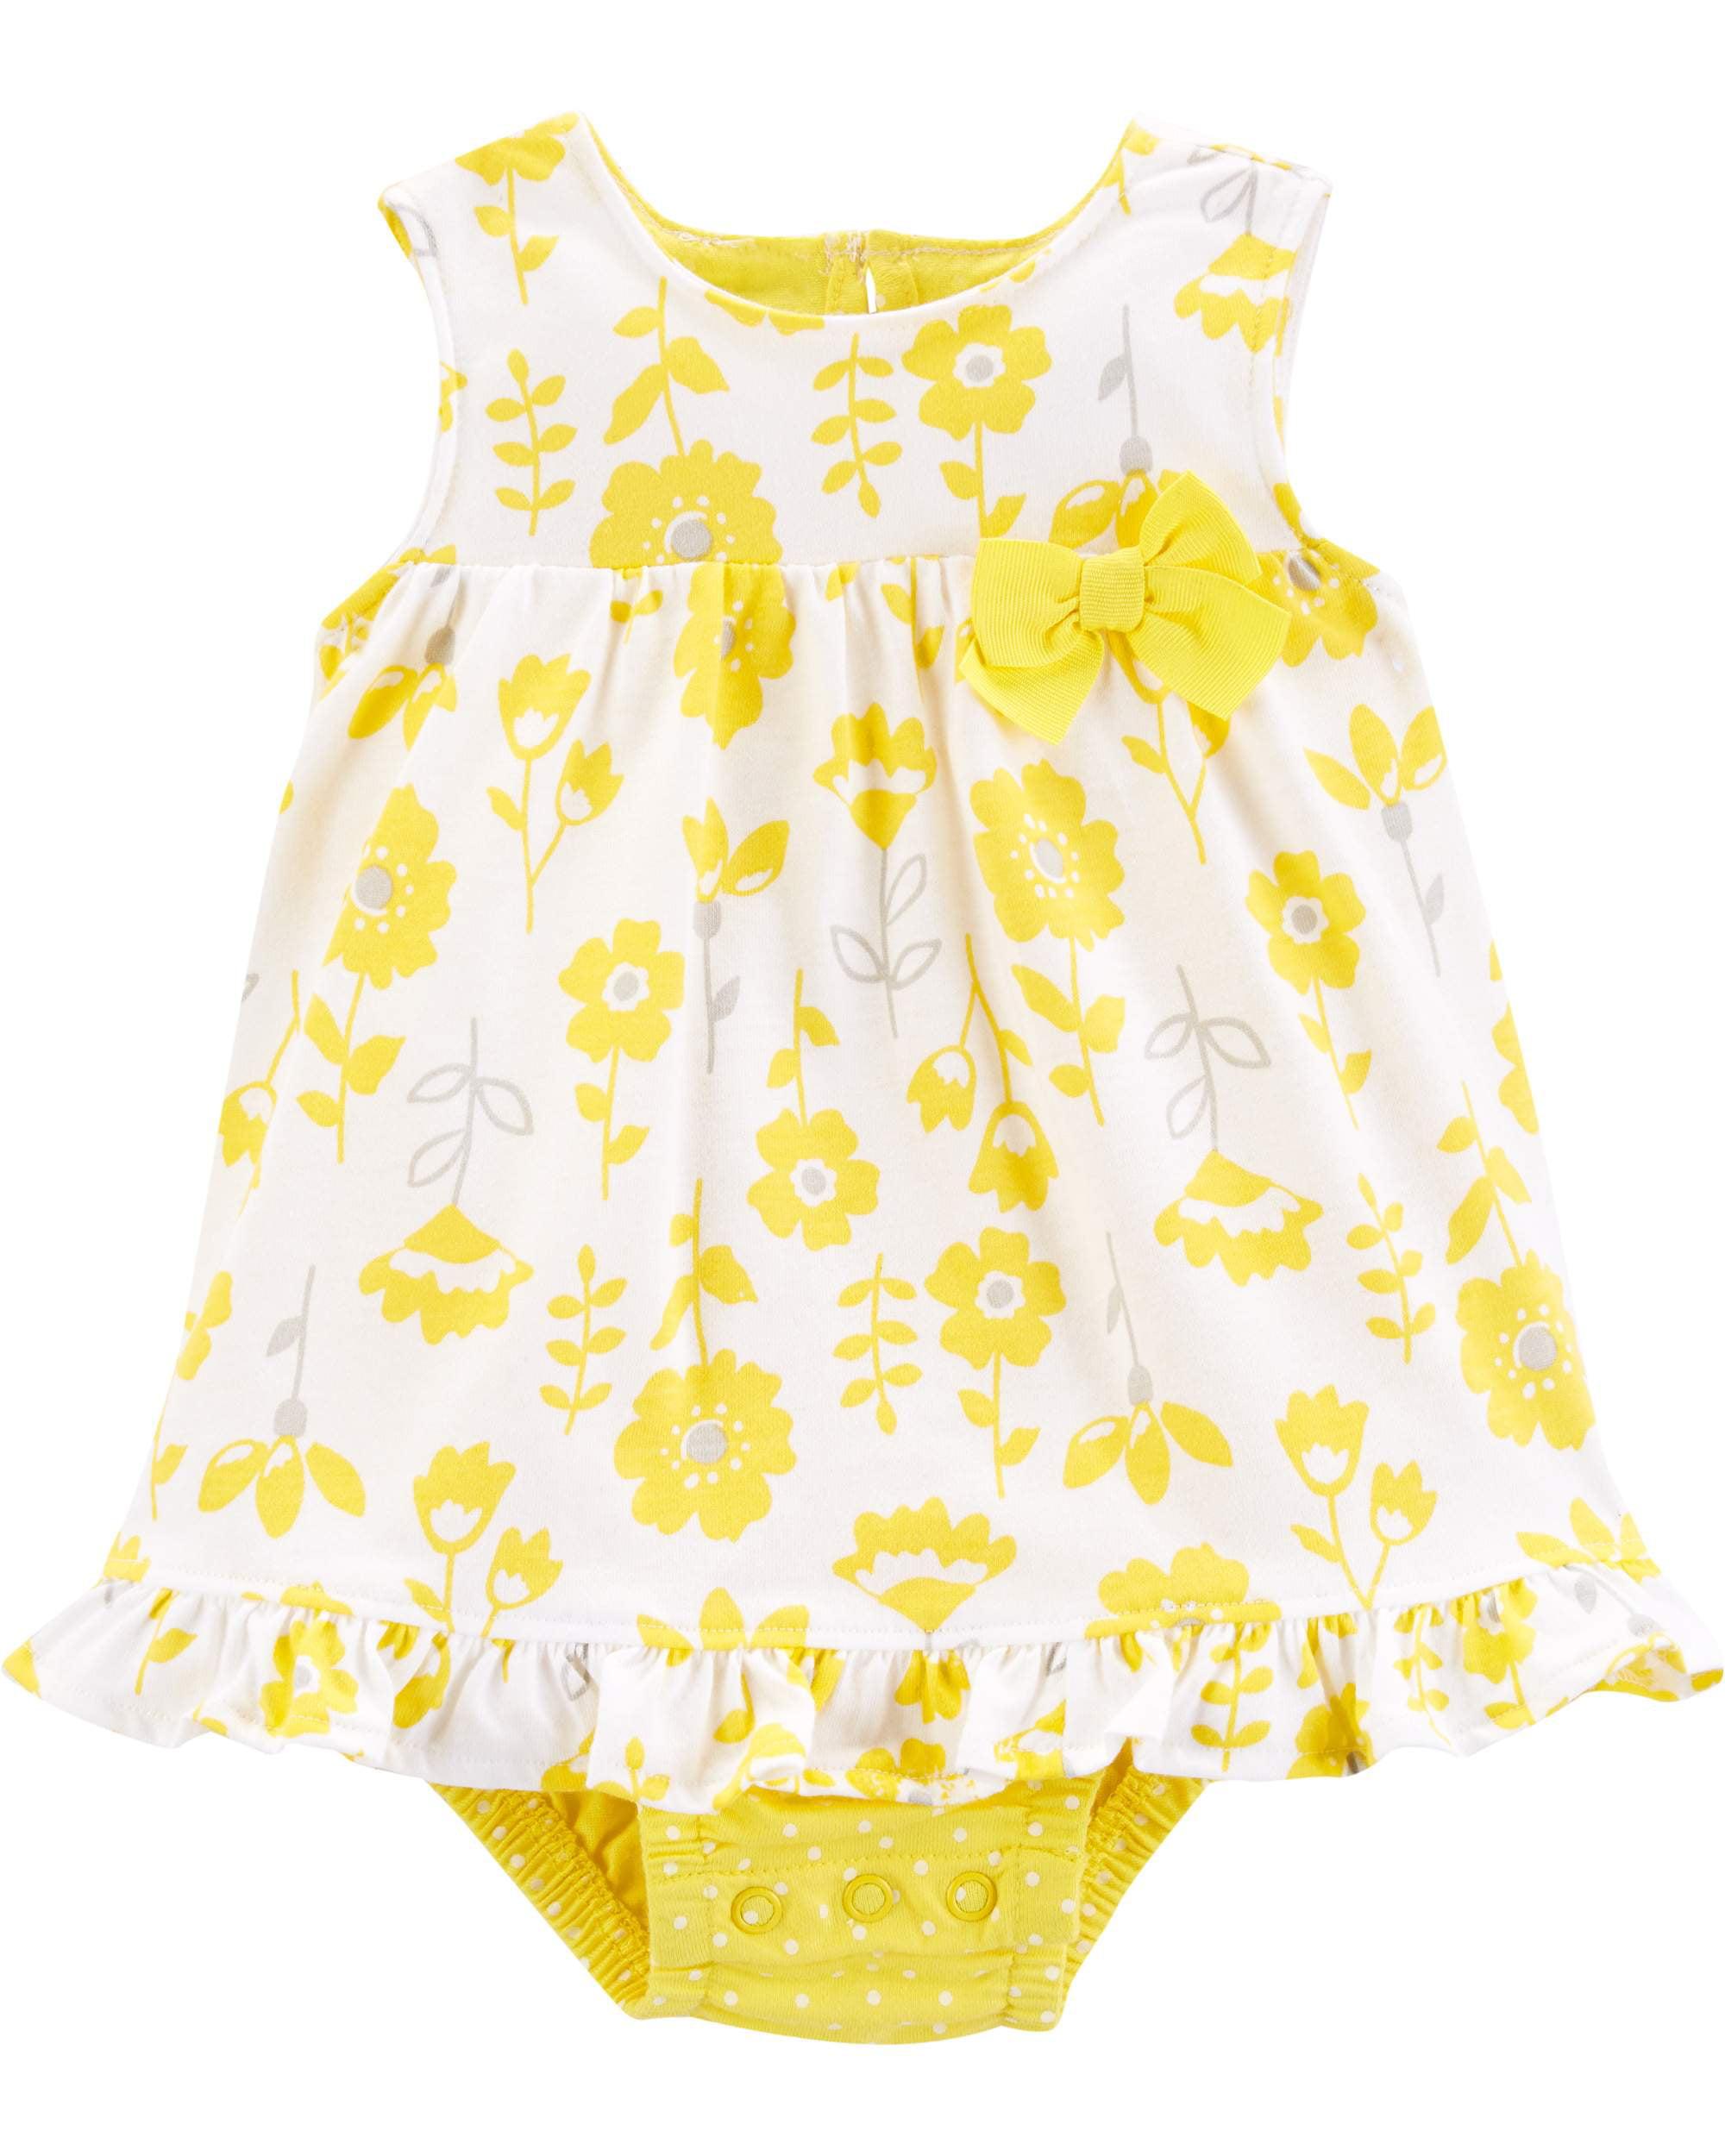 Short Sleeve Sunsuit, 1 pc (Baby Girls)